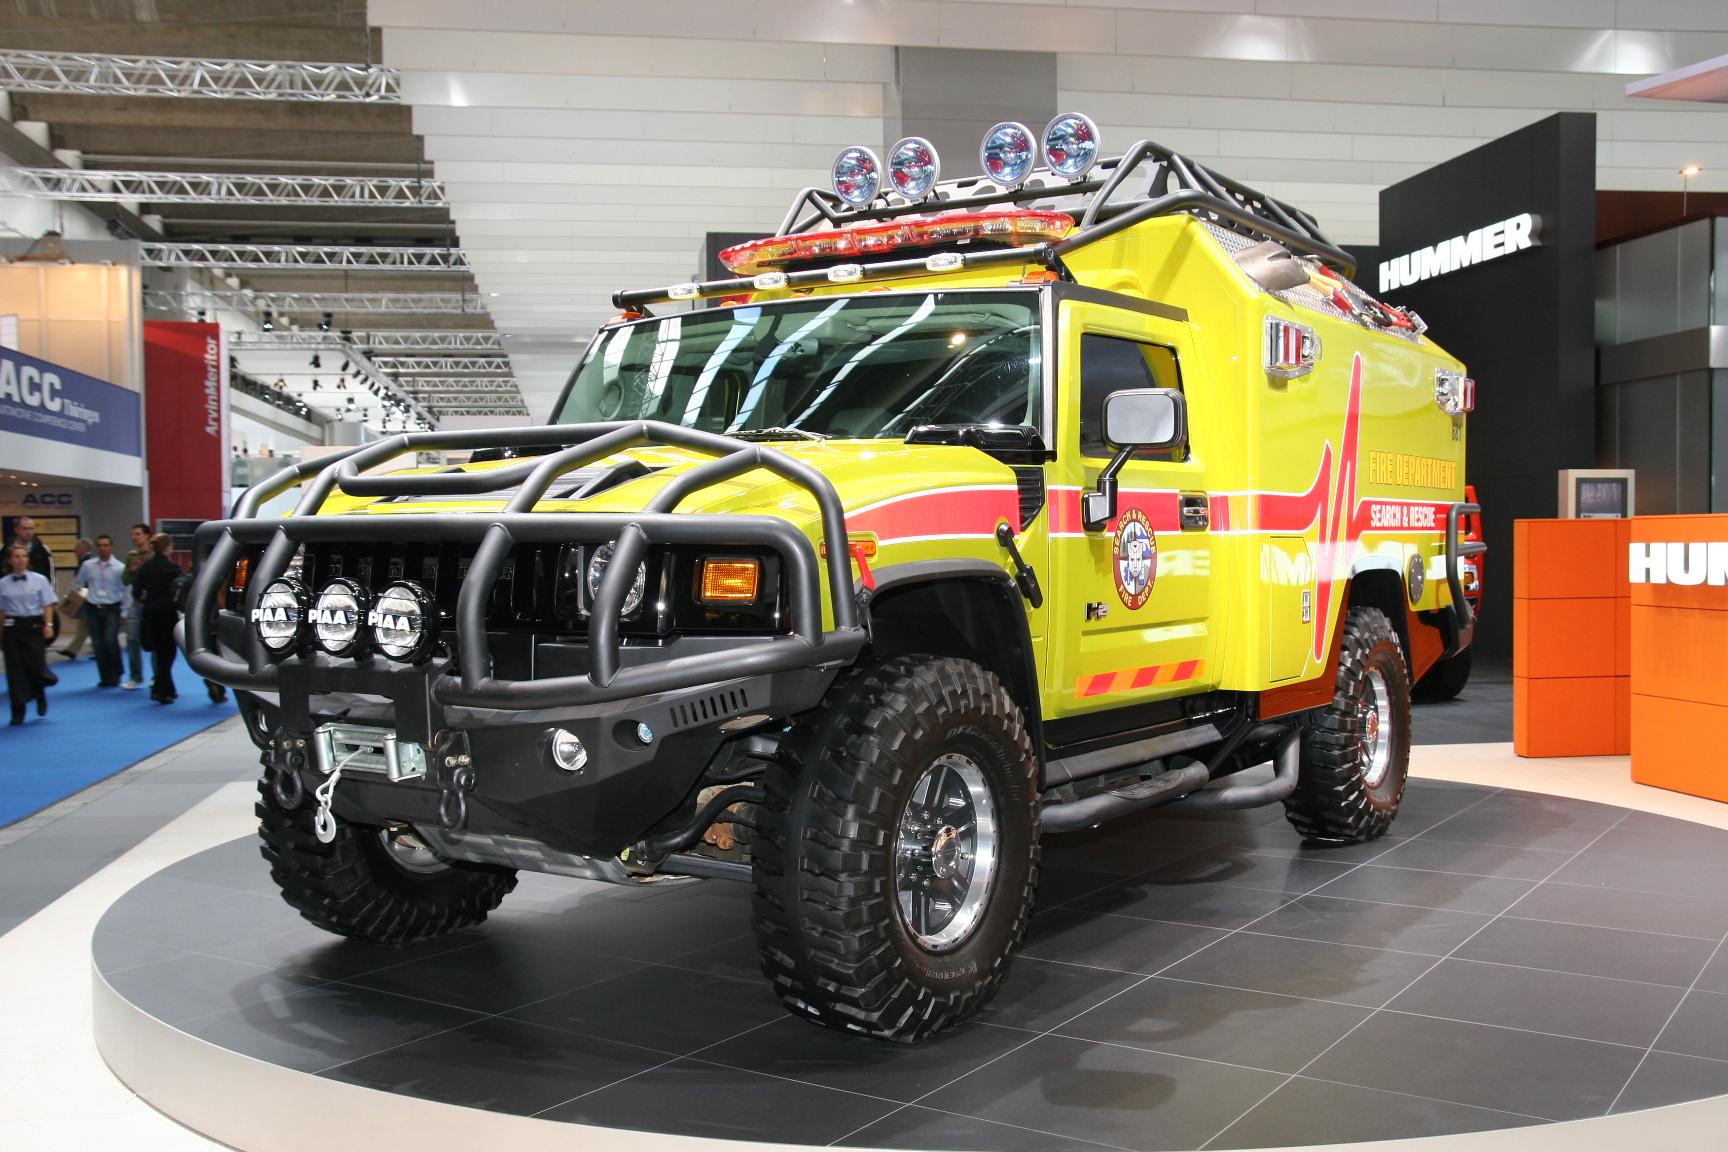 En Direct De Francfort Ratchet Le Hummer H2 De Transformers